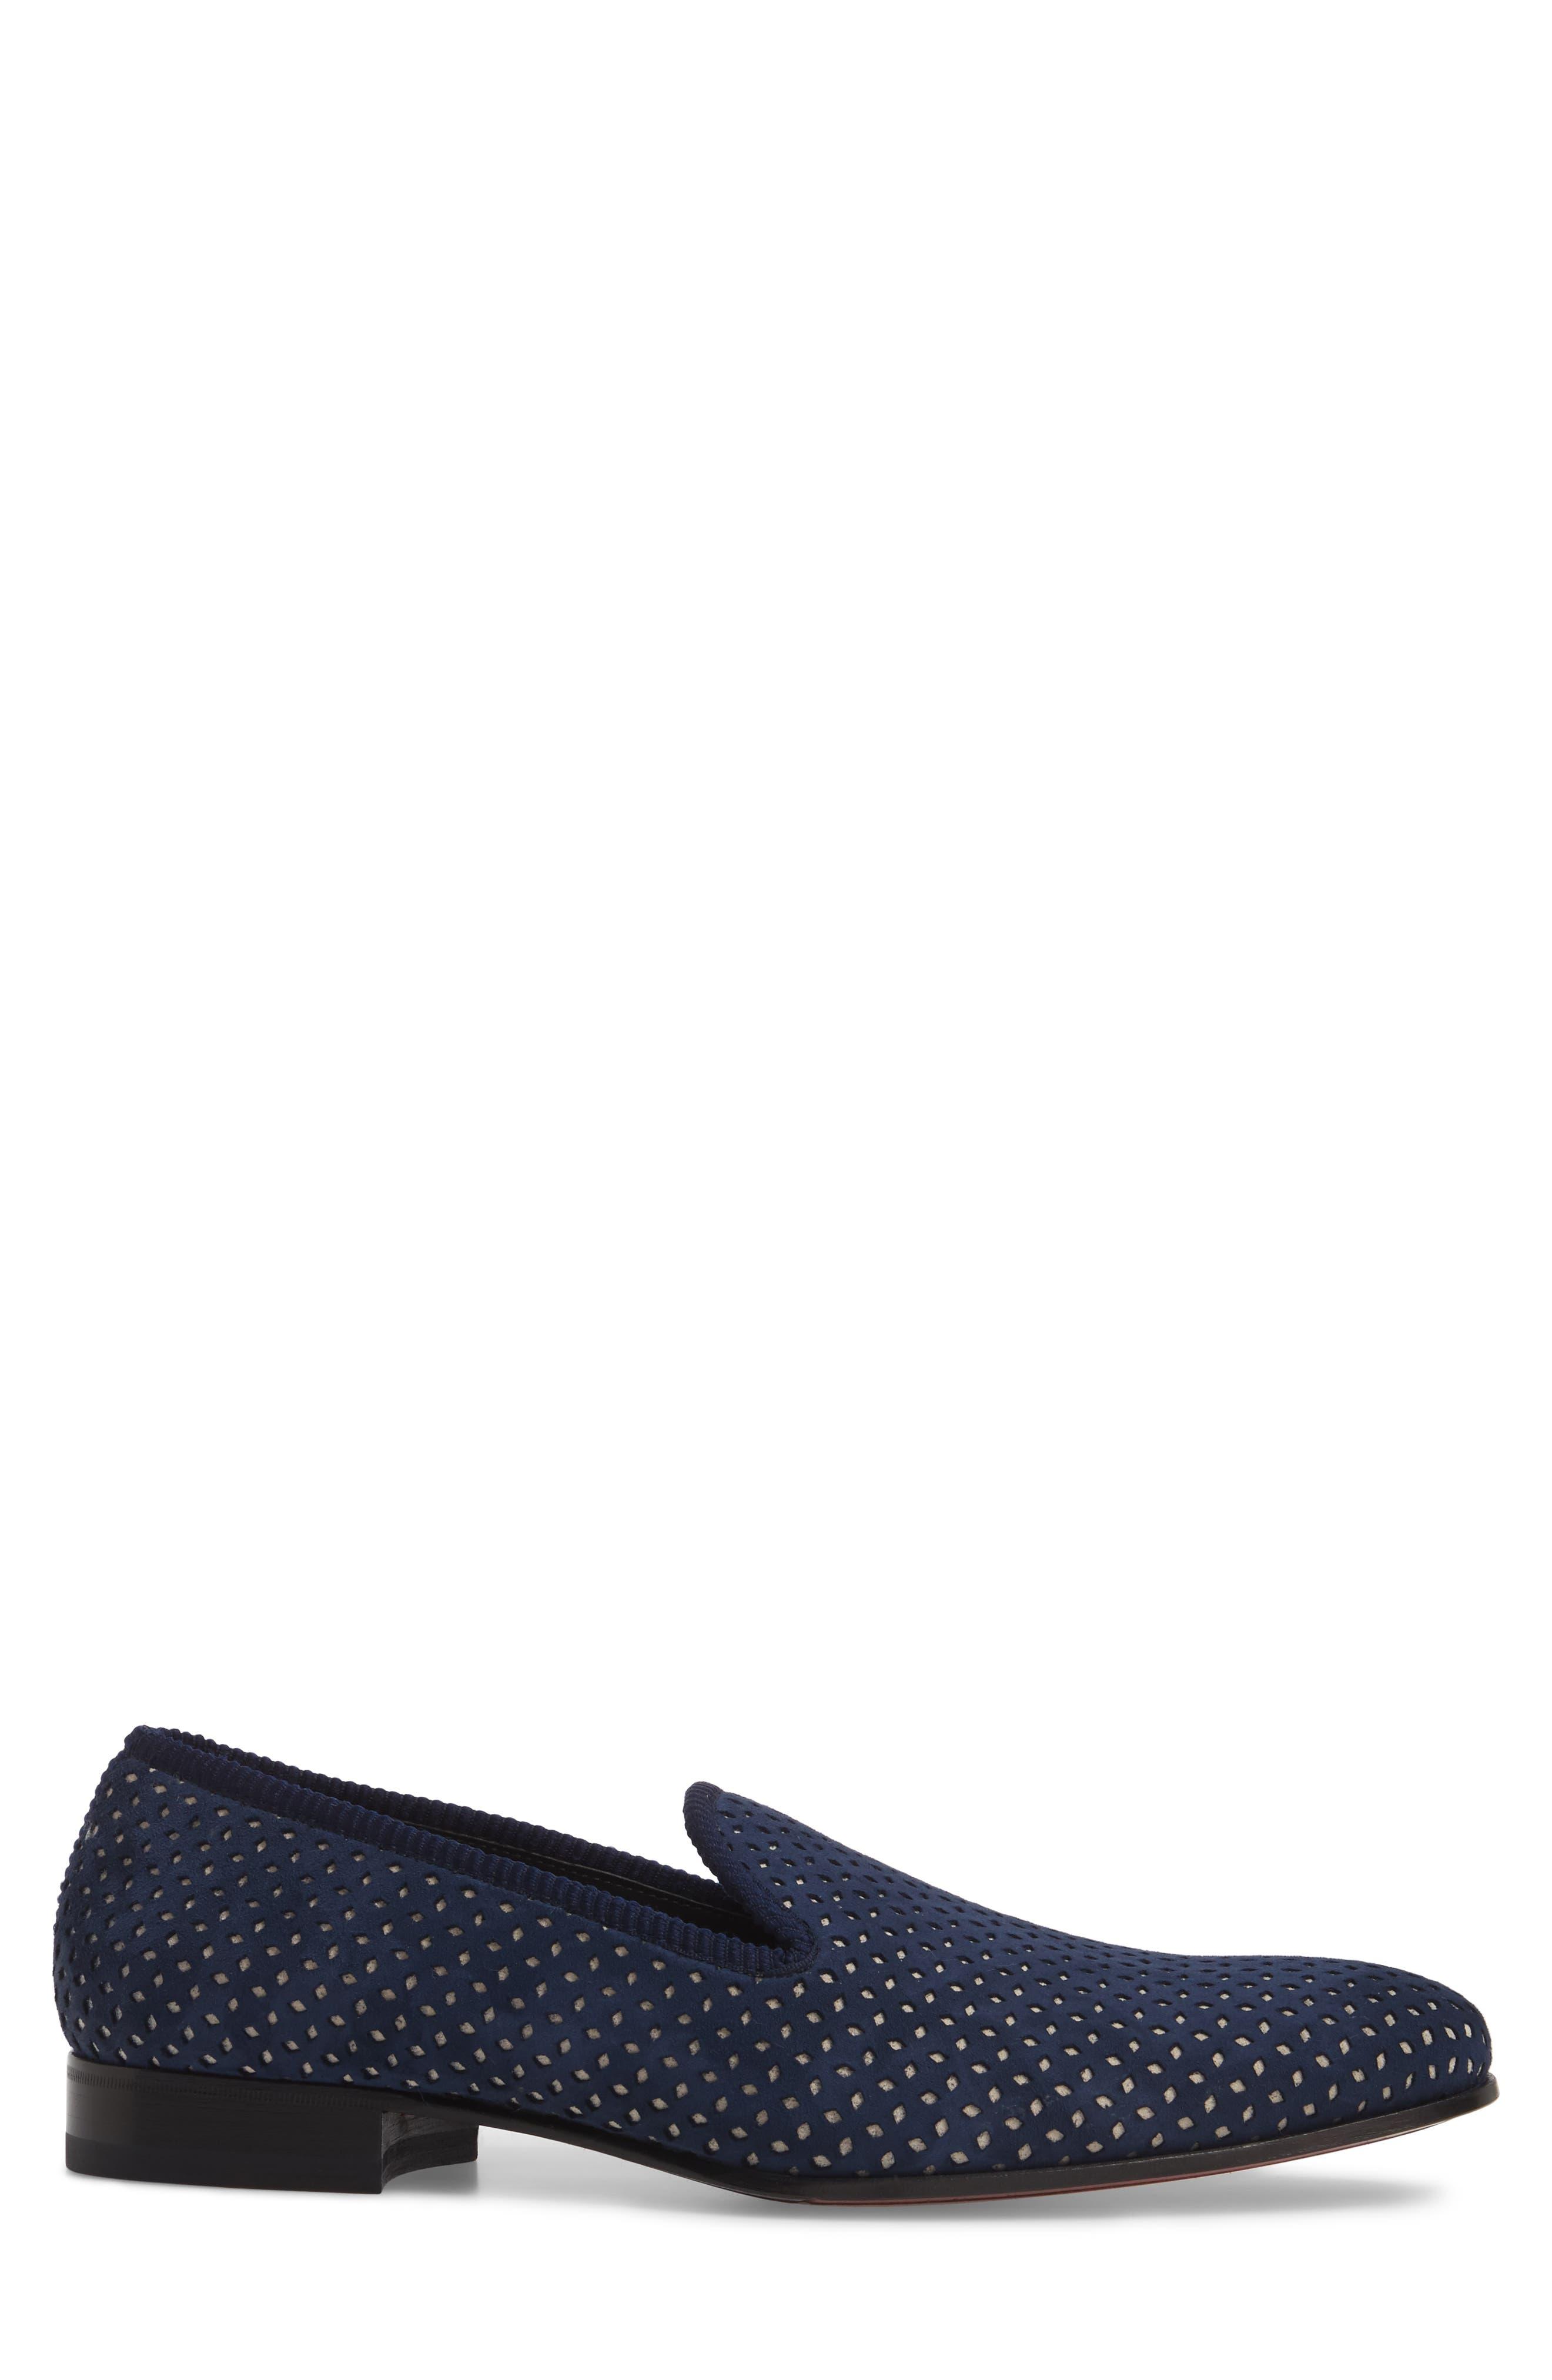 Cibeles Venetian Loafer,                             Alternate thumbnail 3, color,                             Blue/ Bone Suede